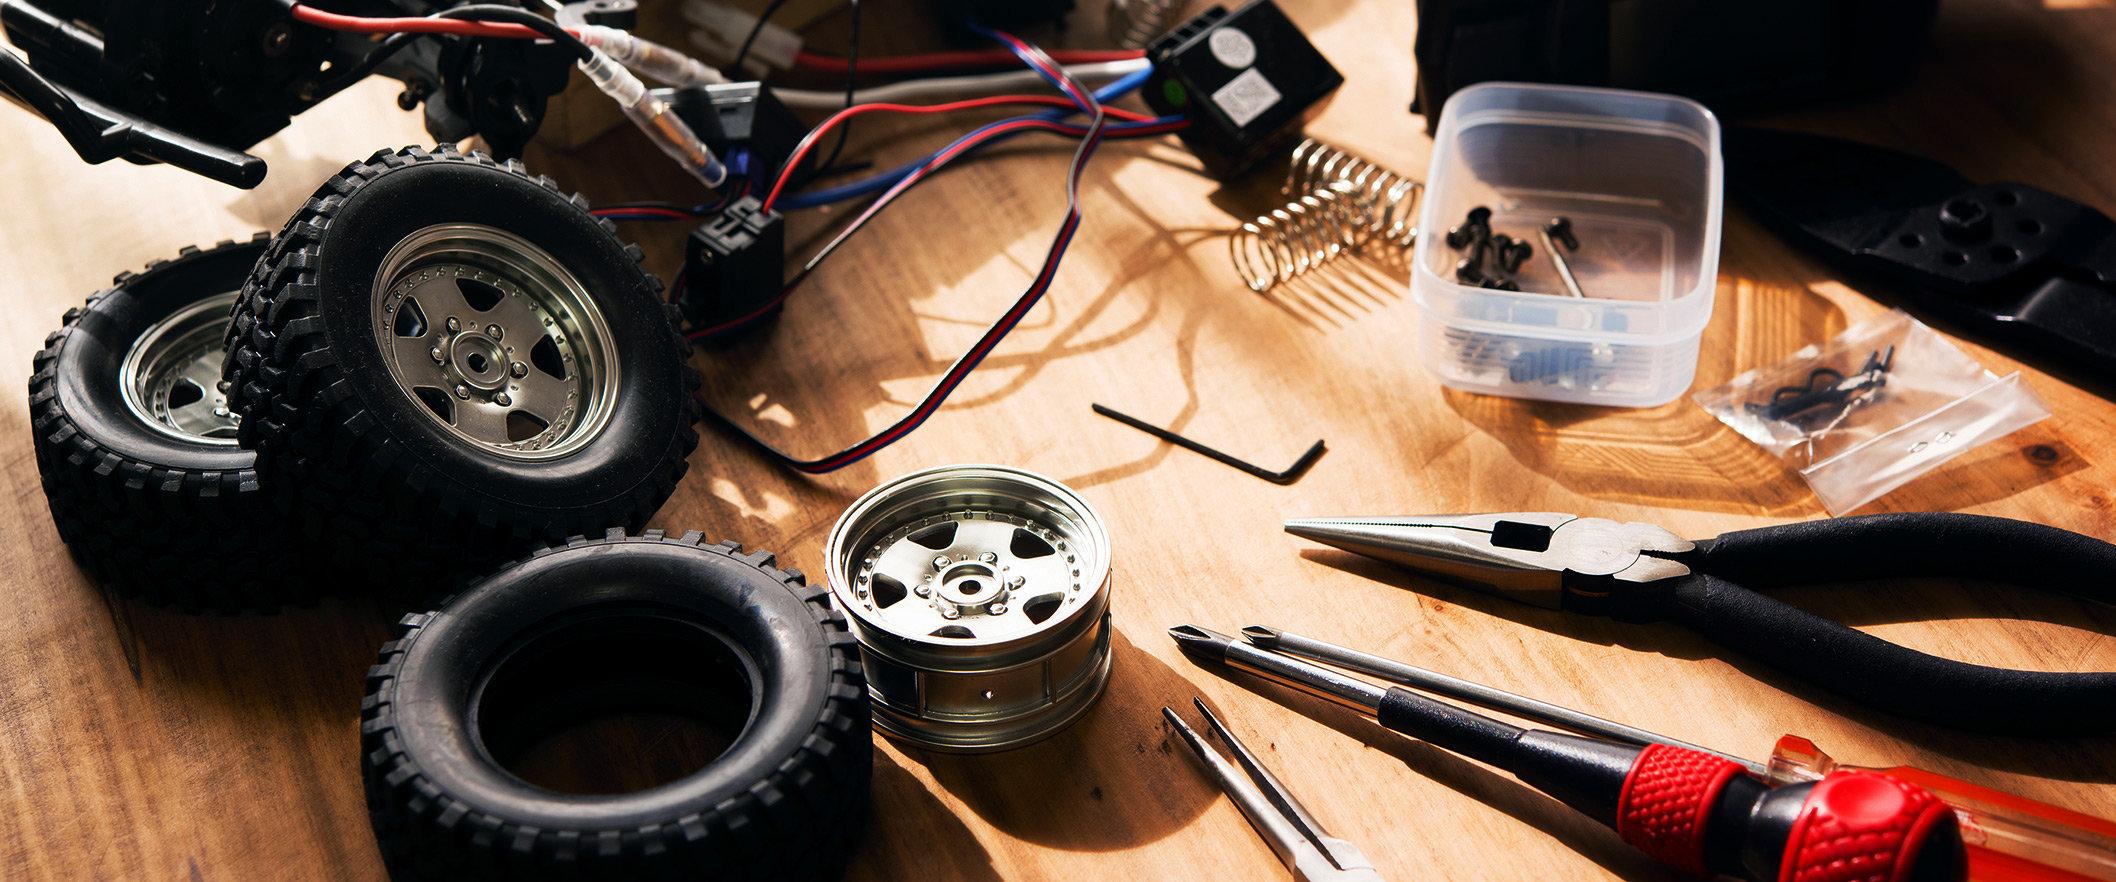 Model Repair Services